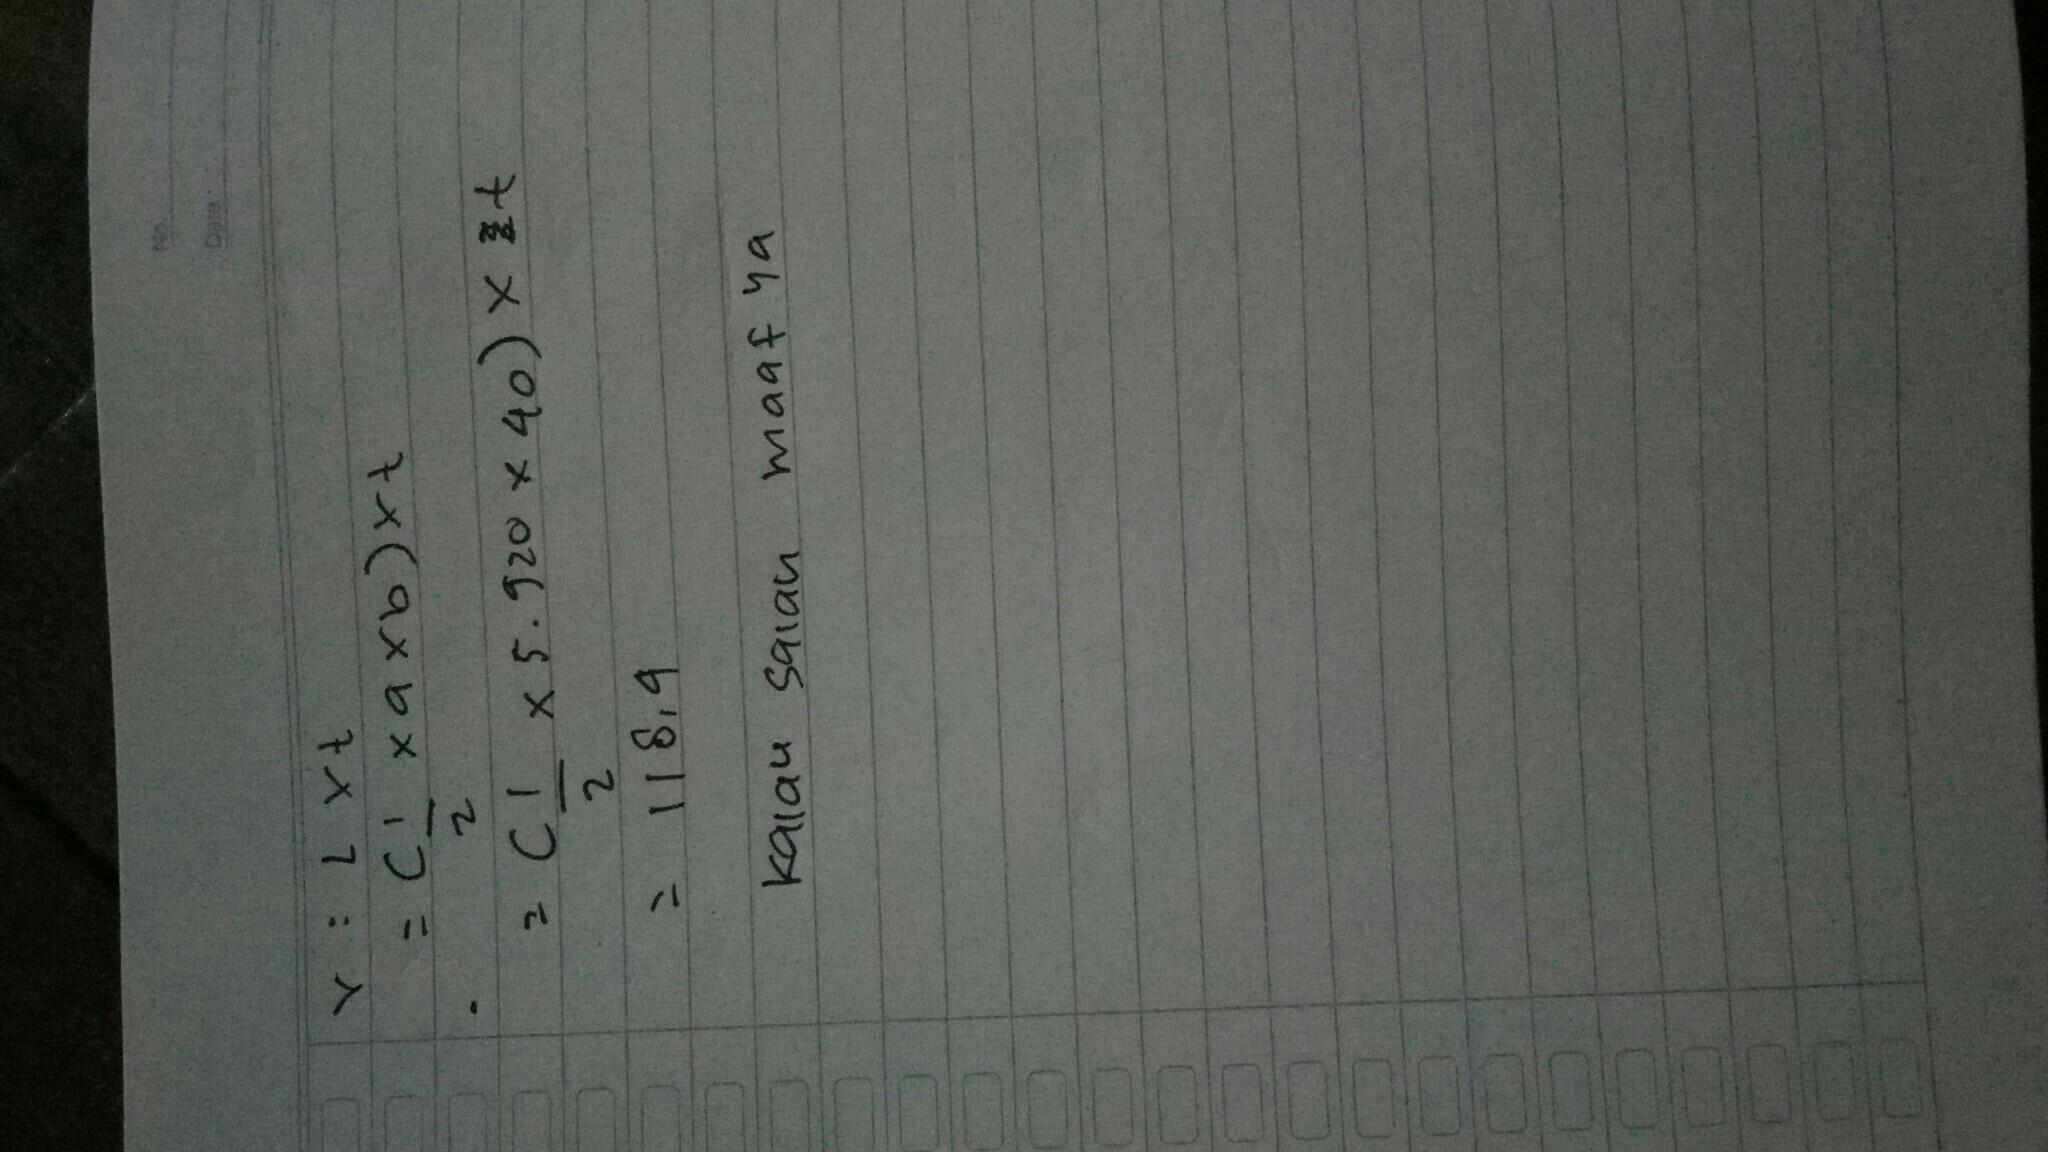 volume sebuah prisma segitiga dngan volume 5.920cm³ .Jika ...